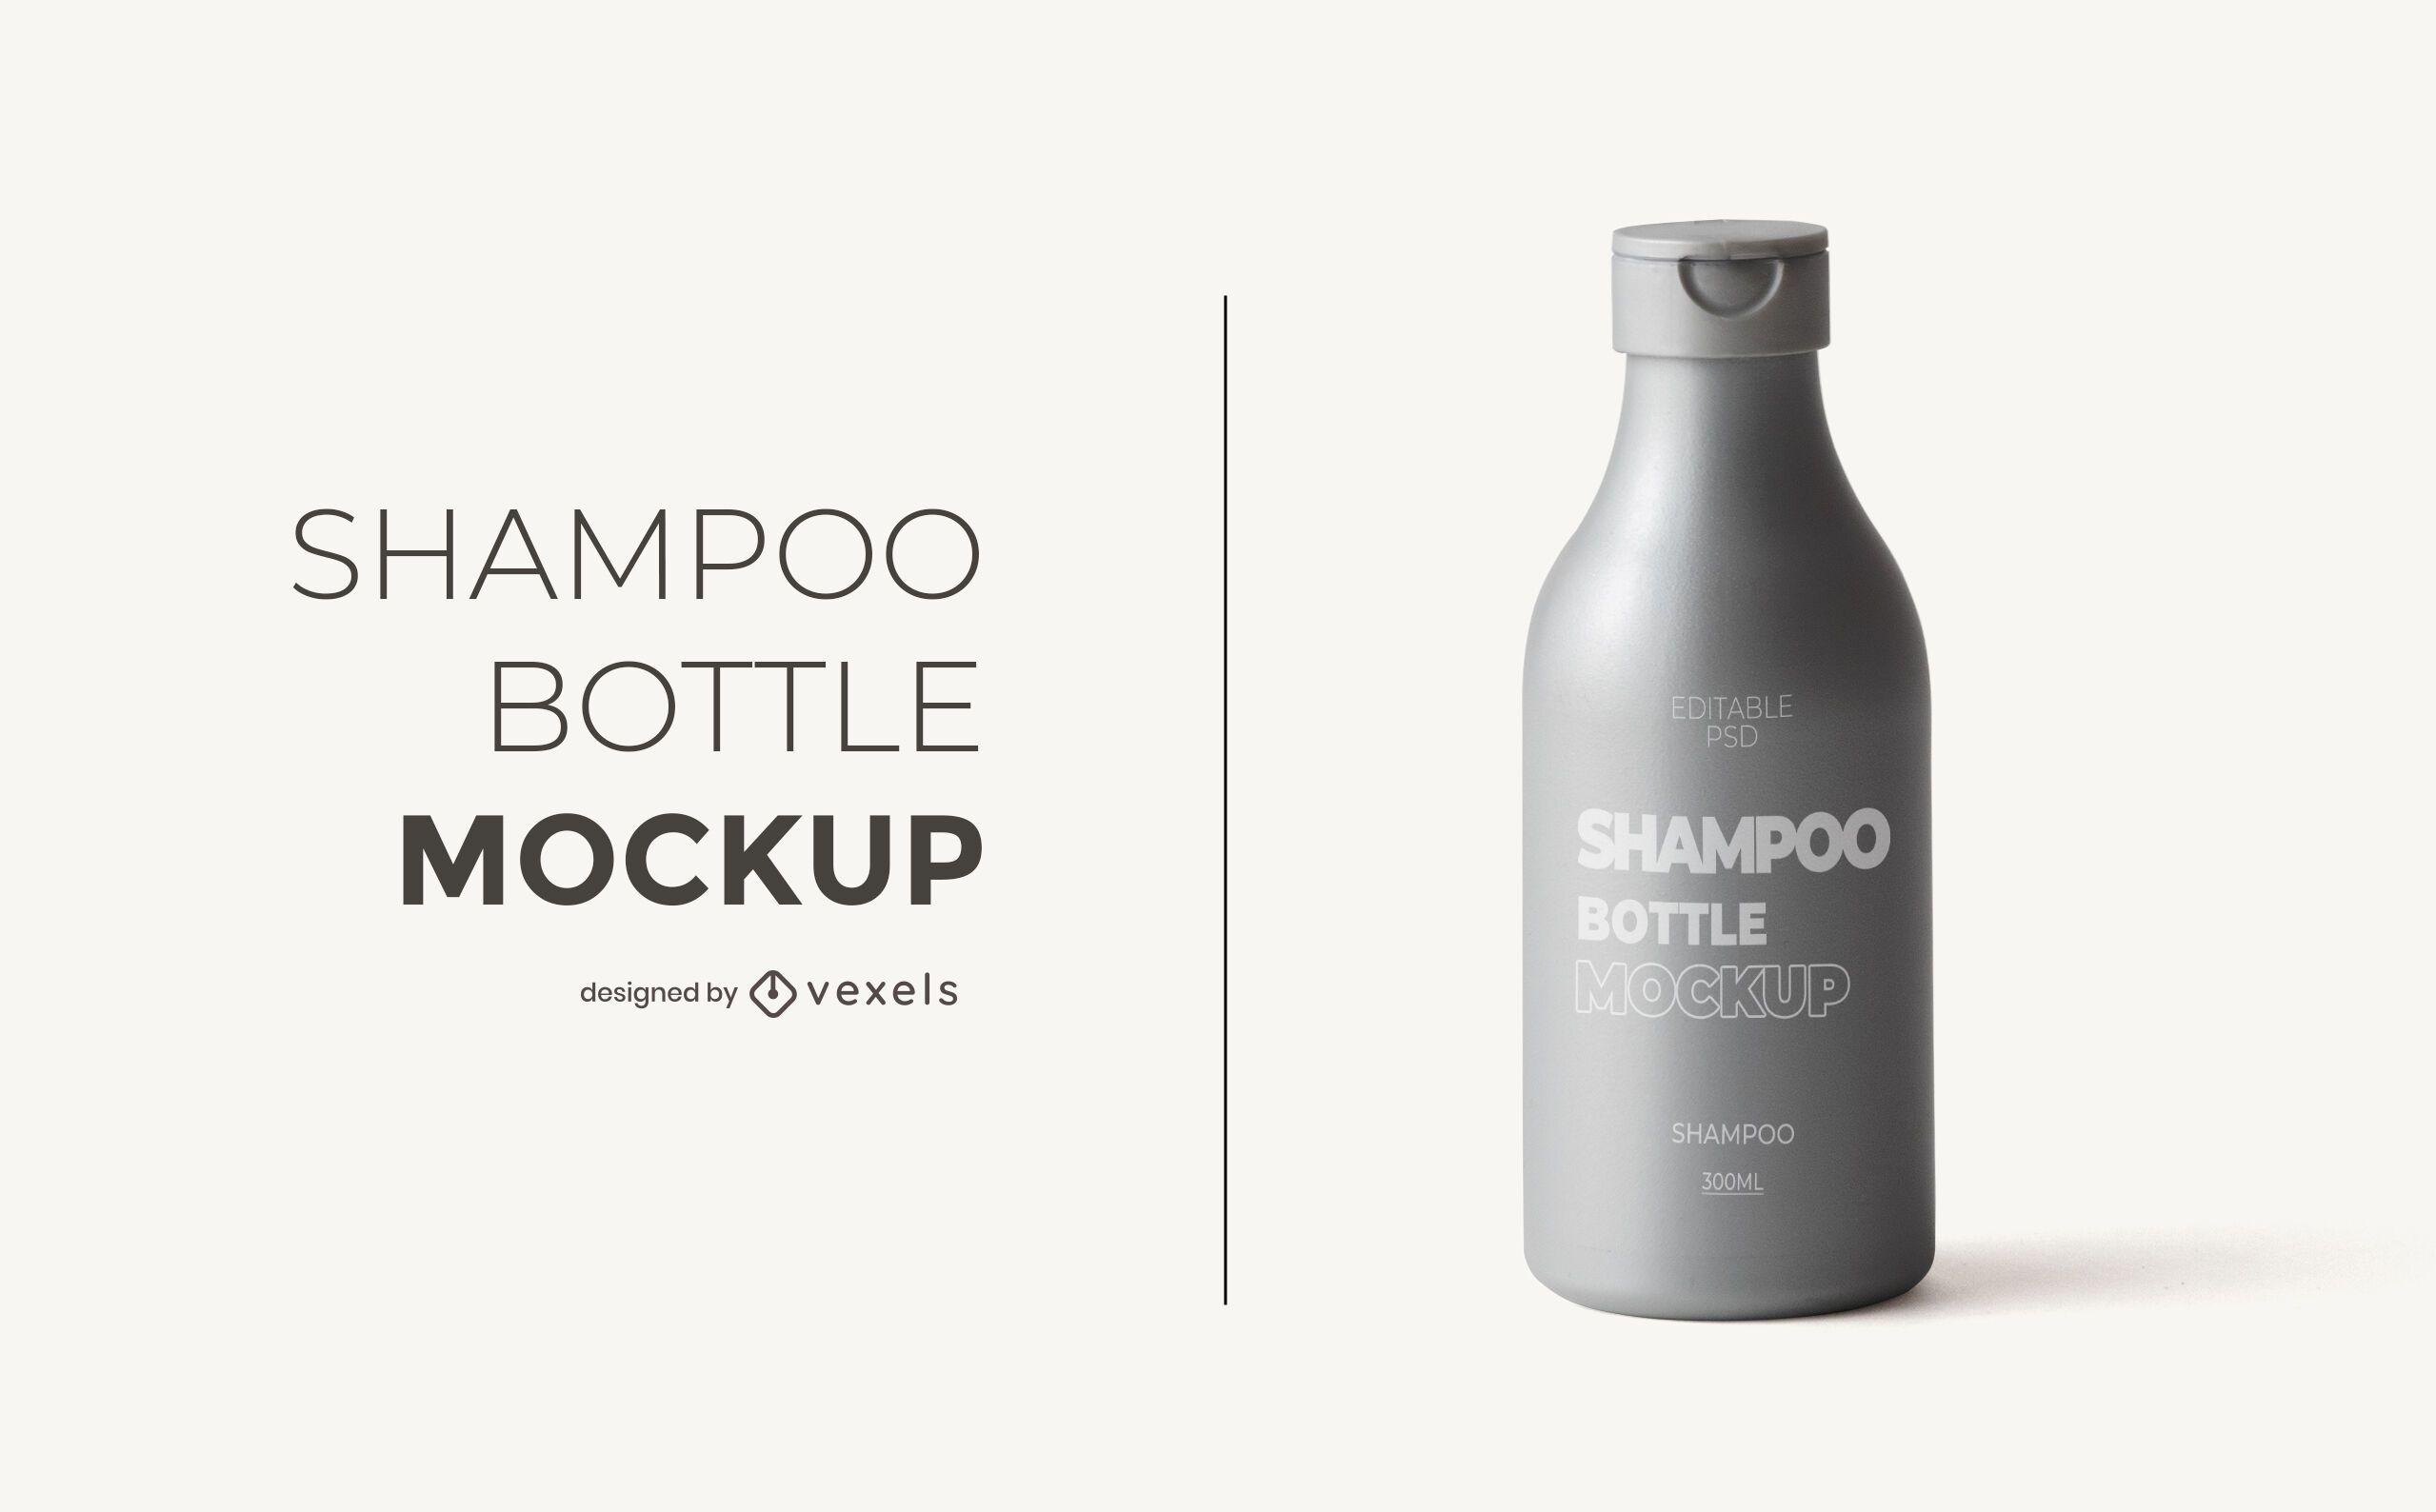 Shampoo bottle mockup design